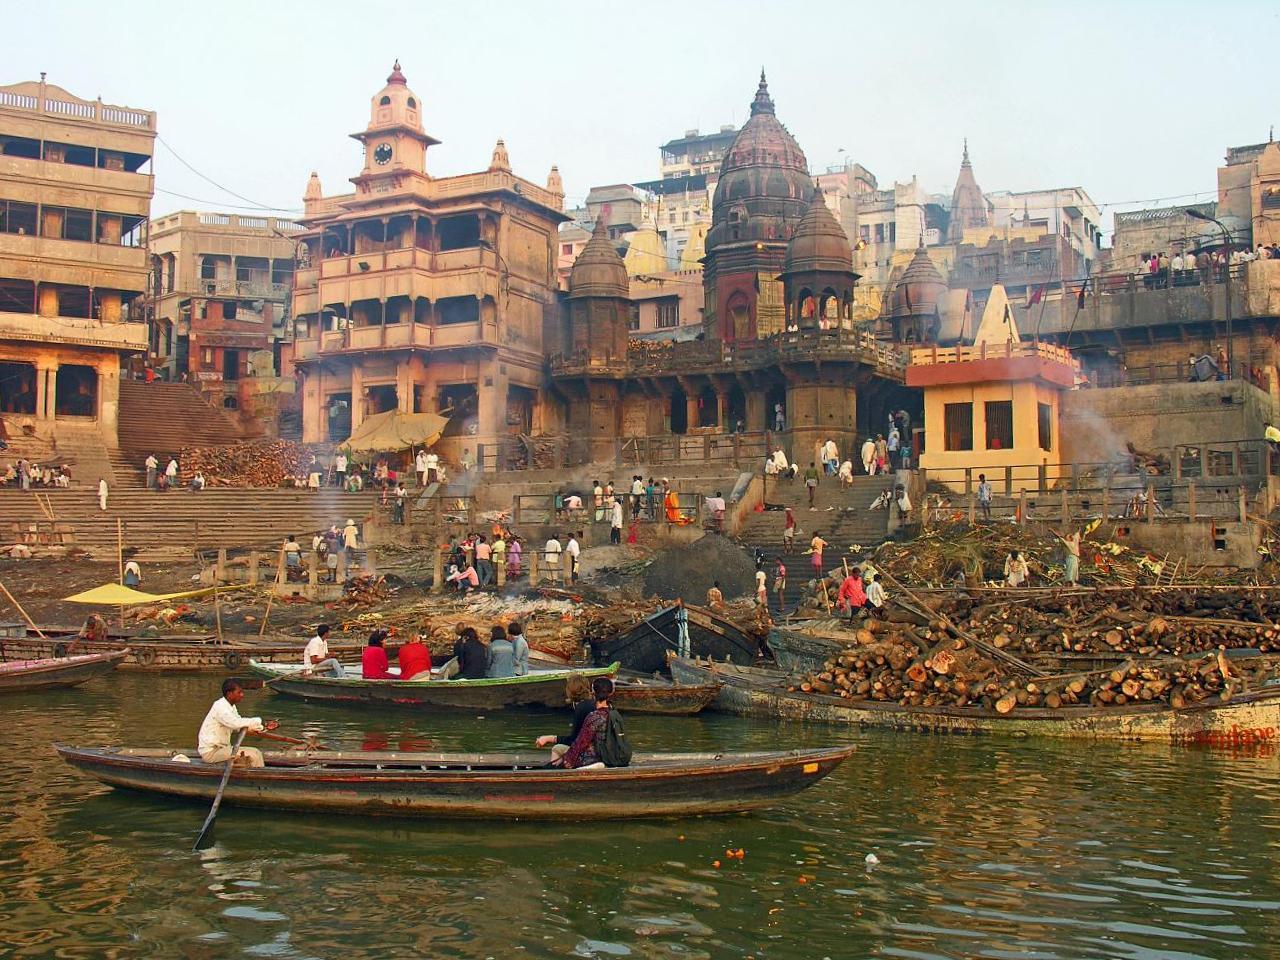 Manikarnika Ghat Best Place To Visit in Varanasi